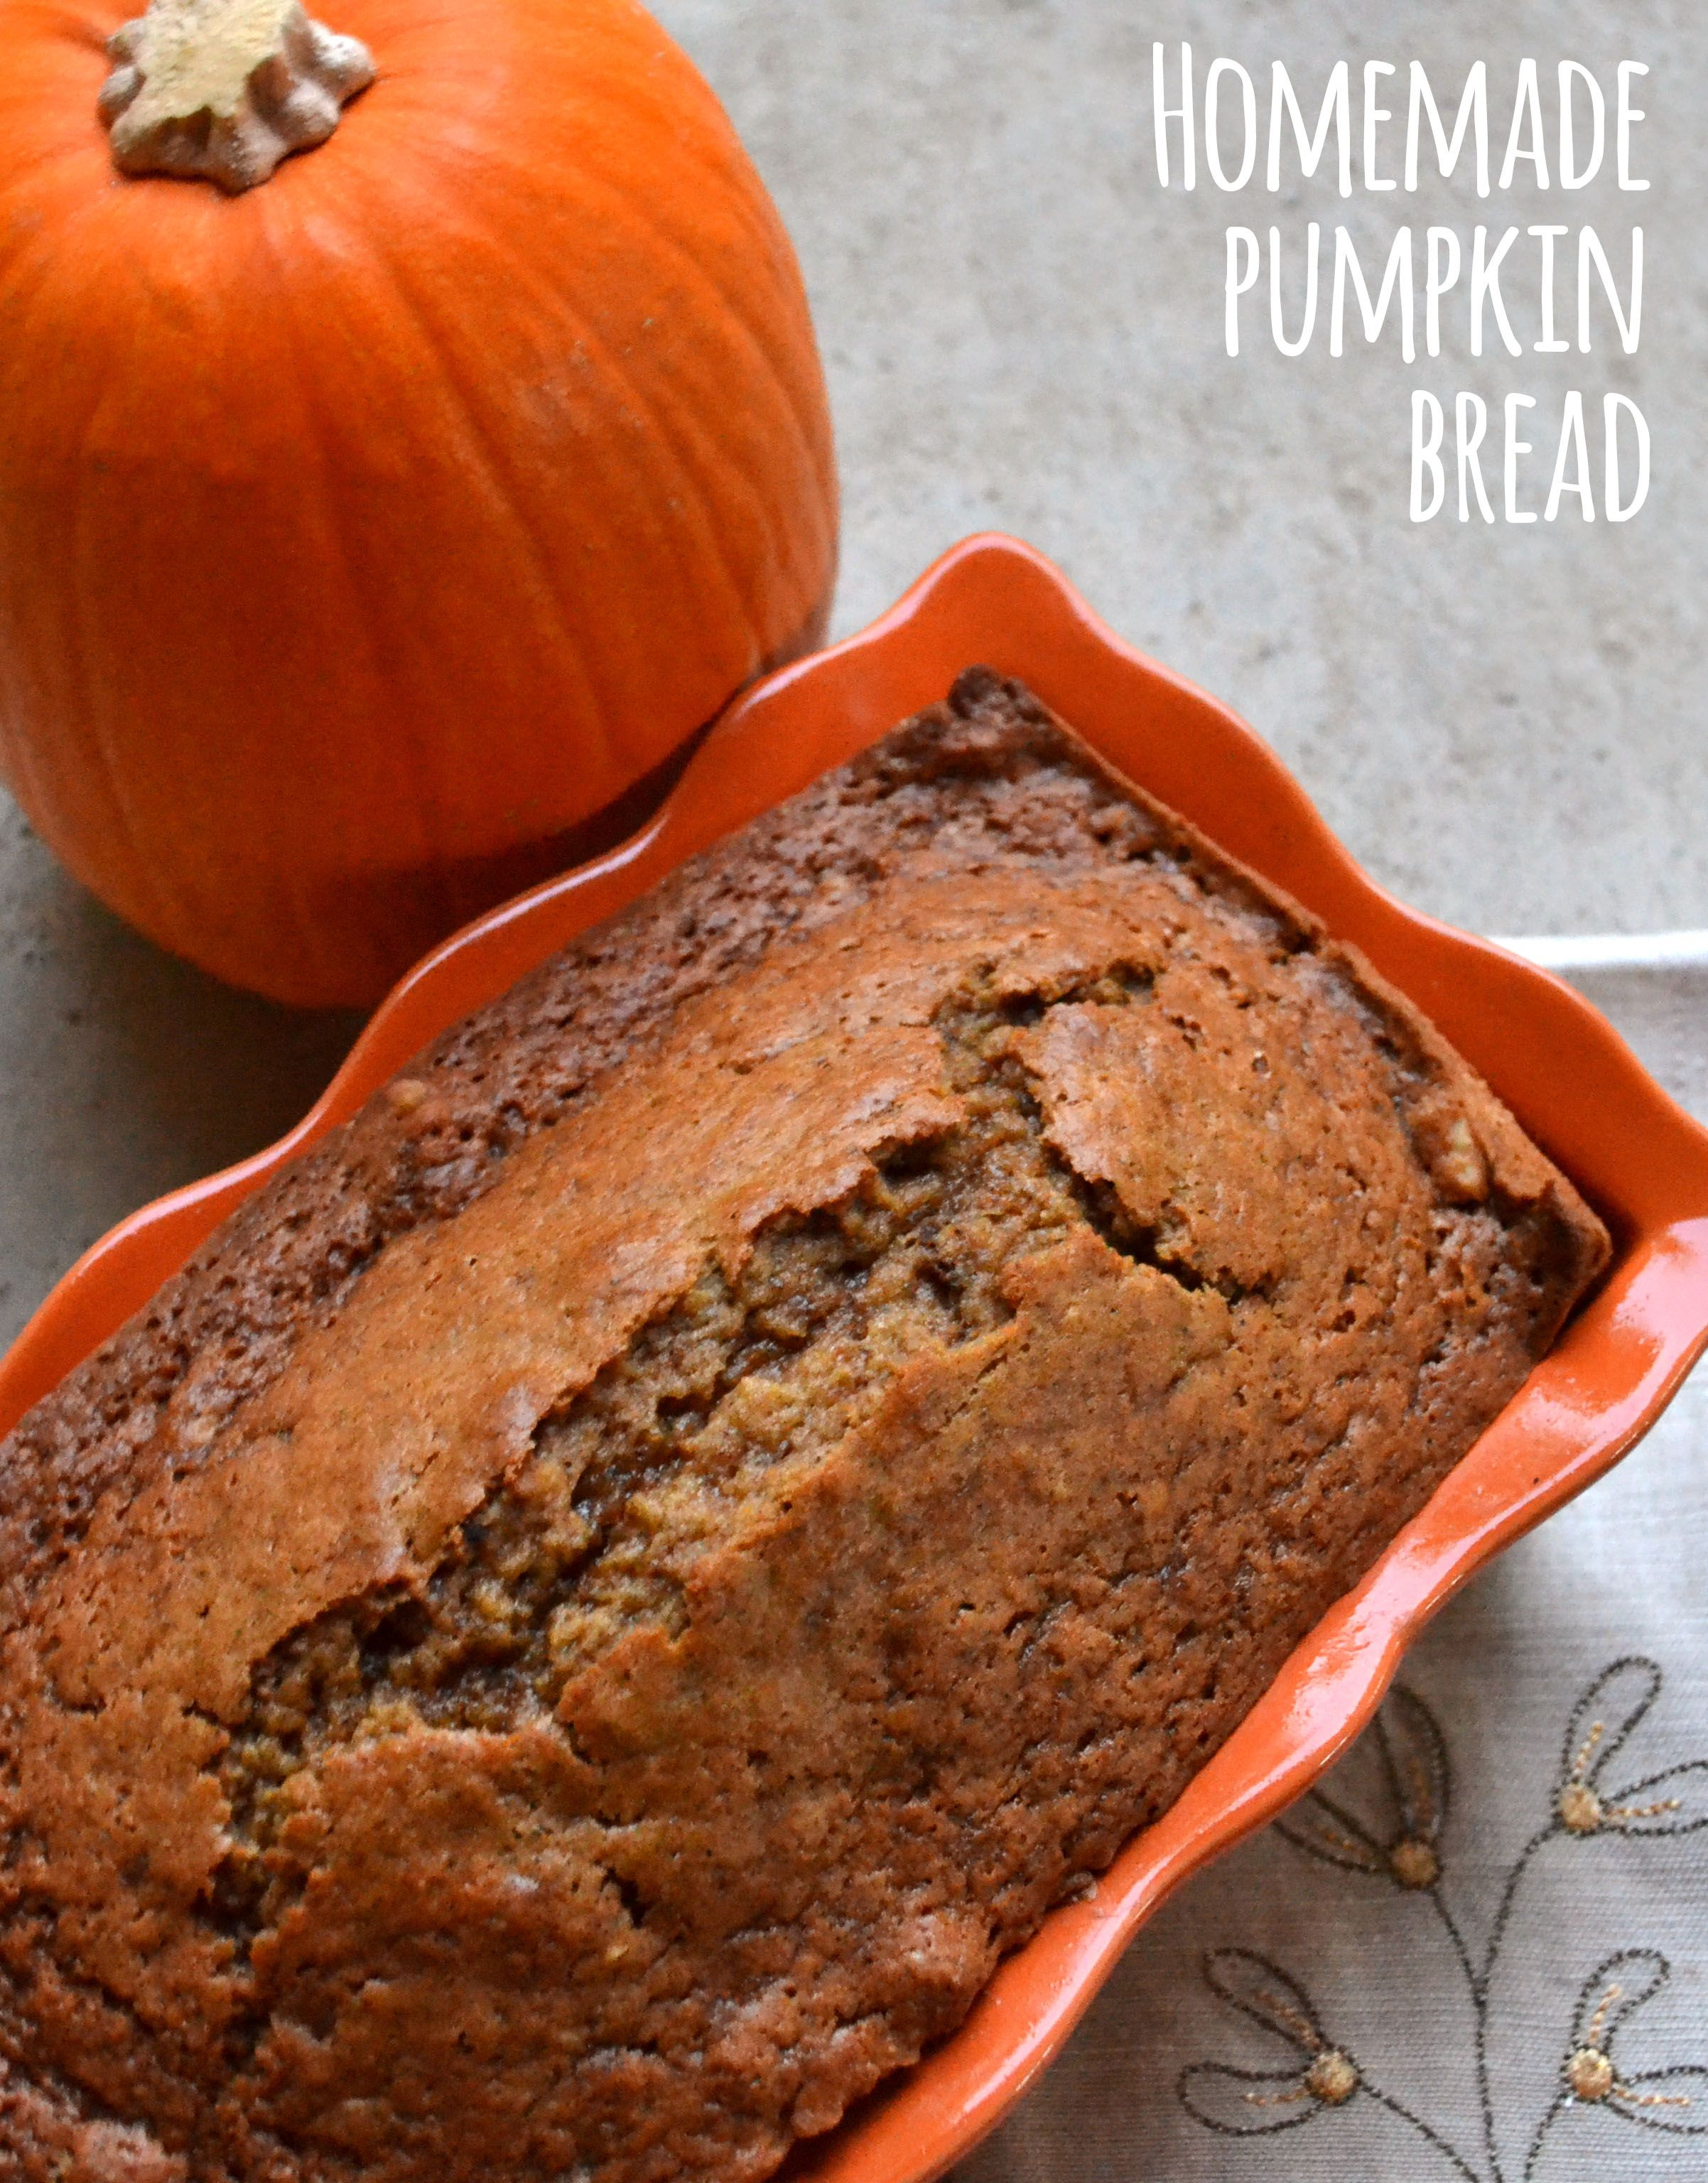 Pumpkin Bread with Raisins and Pecans